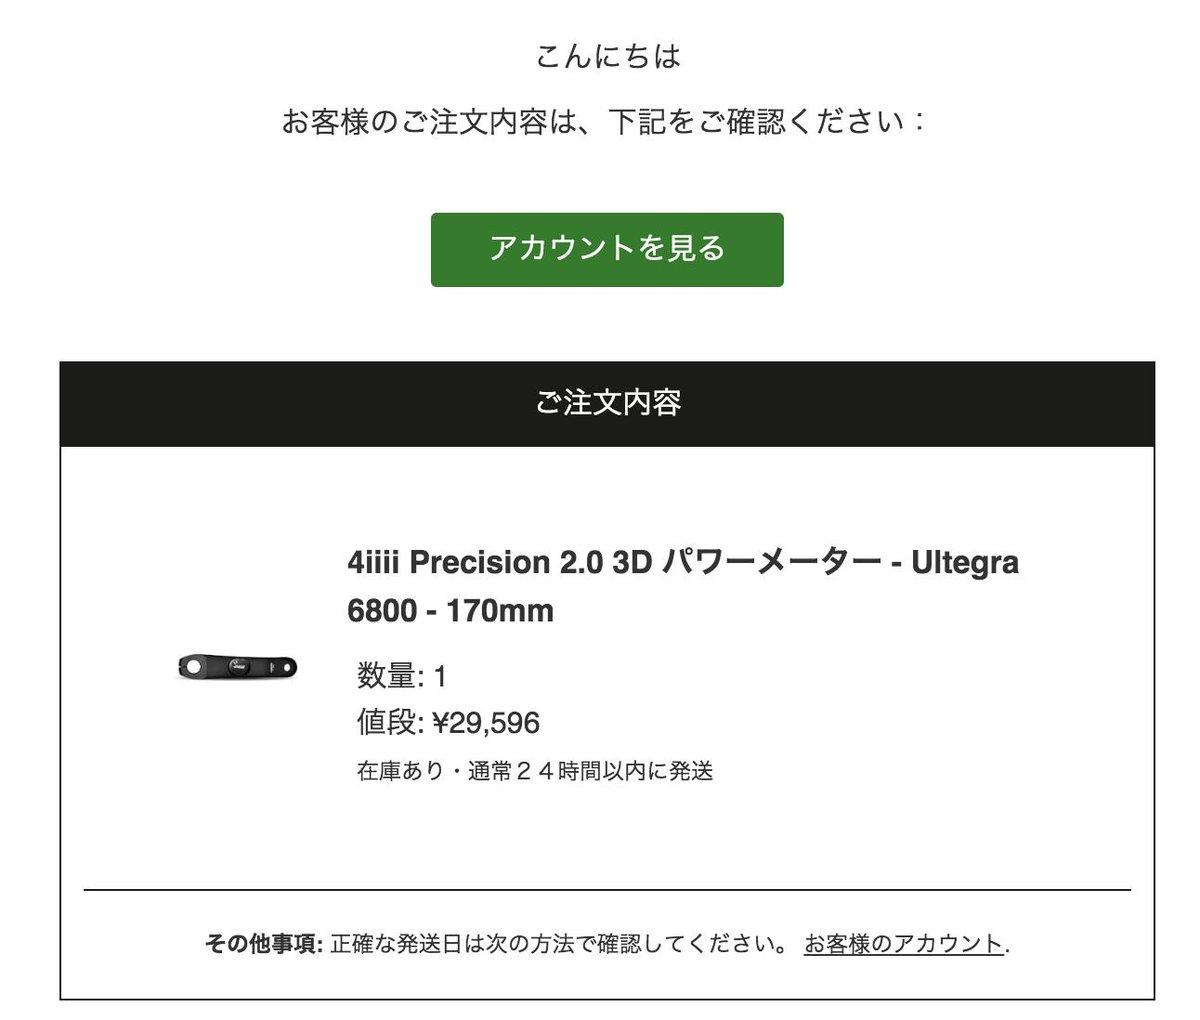 4iiii Precision 2.0 3D パワーメーター